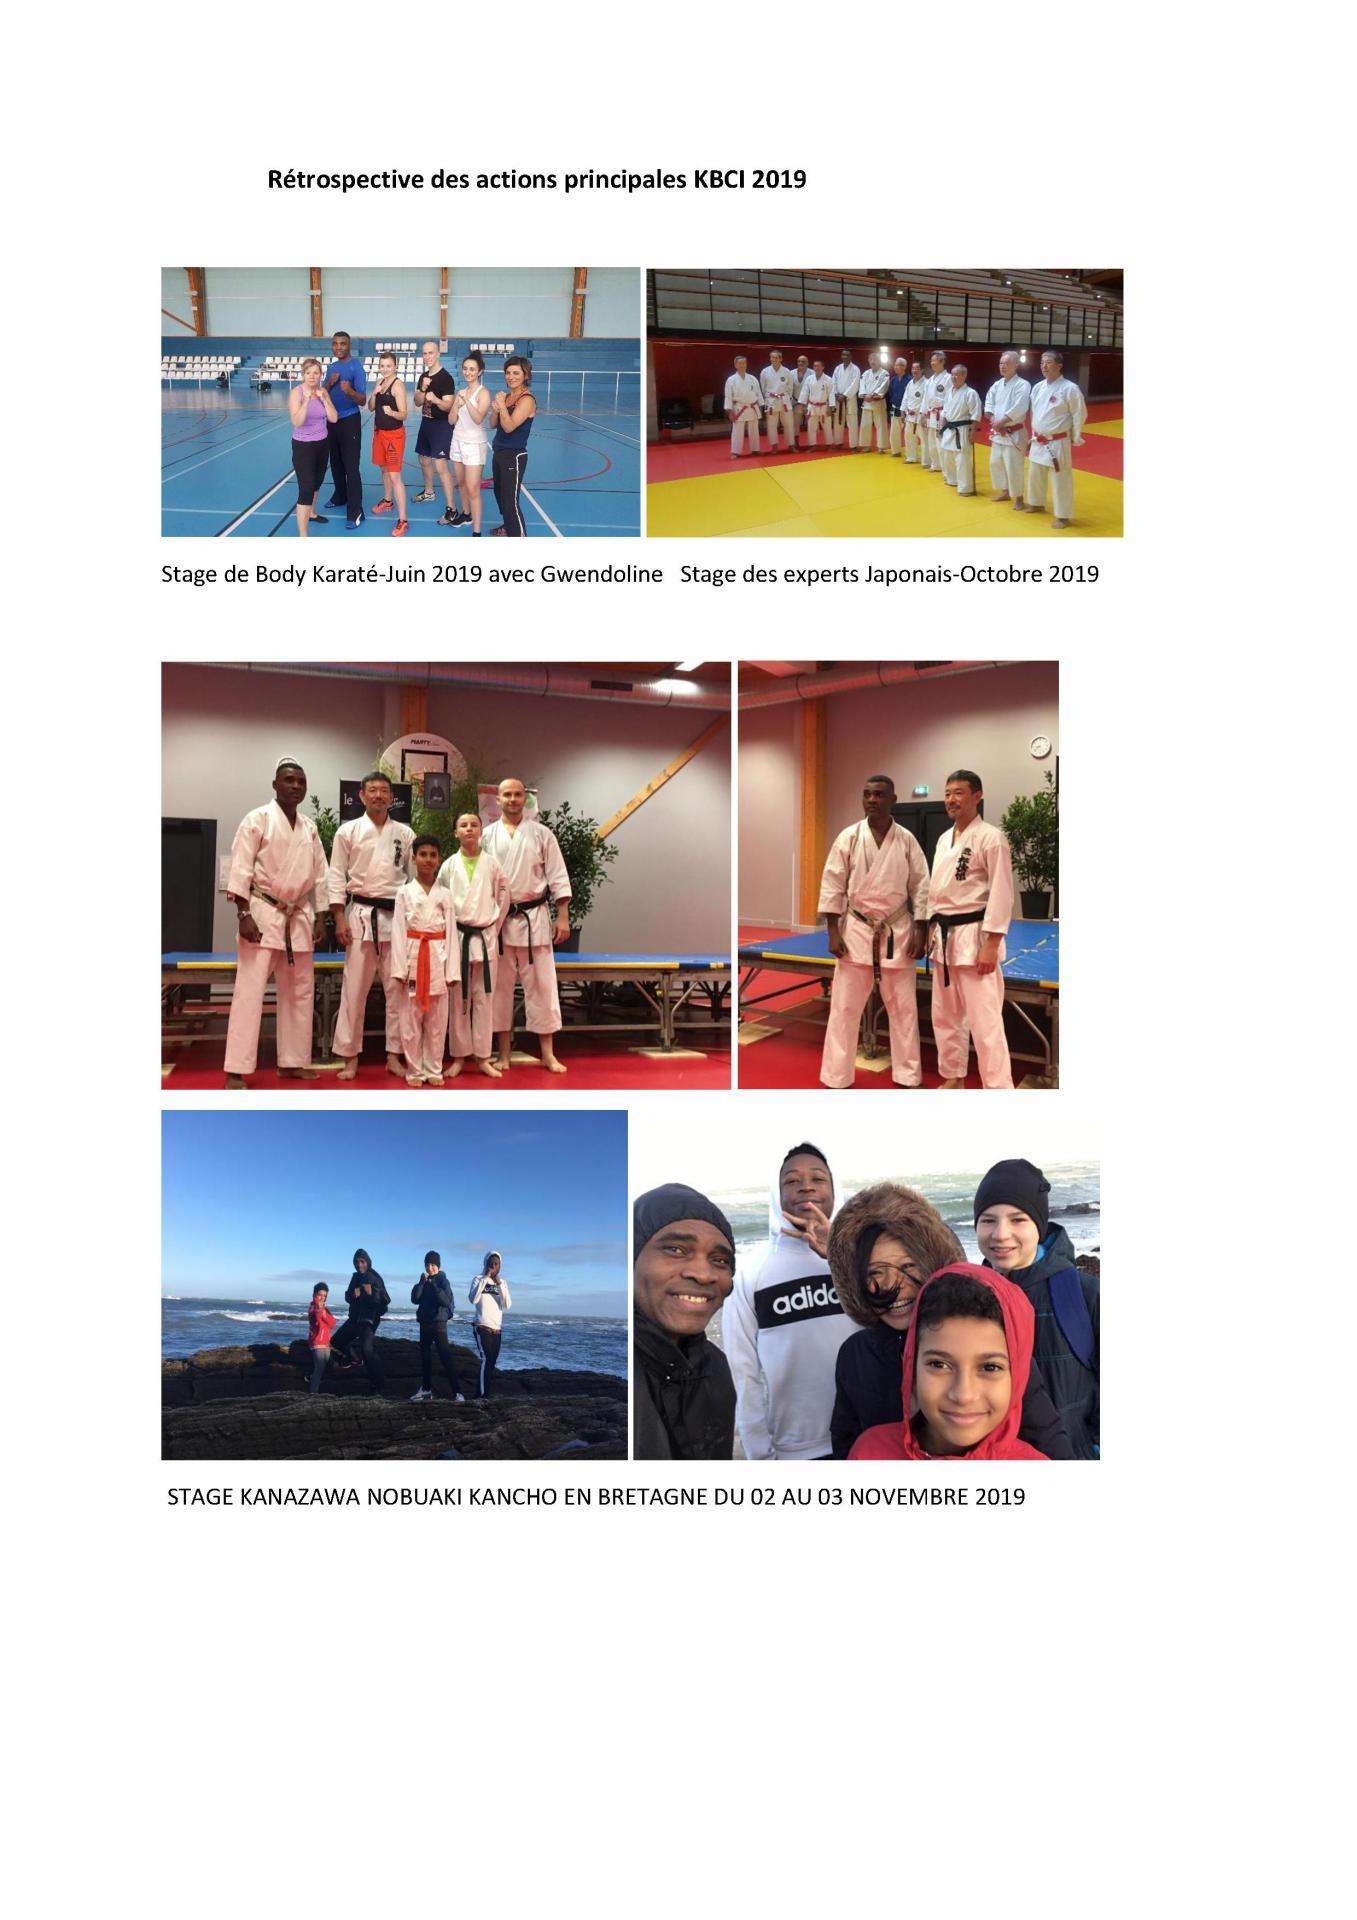 Retrospective des actions principales kbci 2019 2